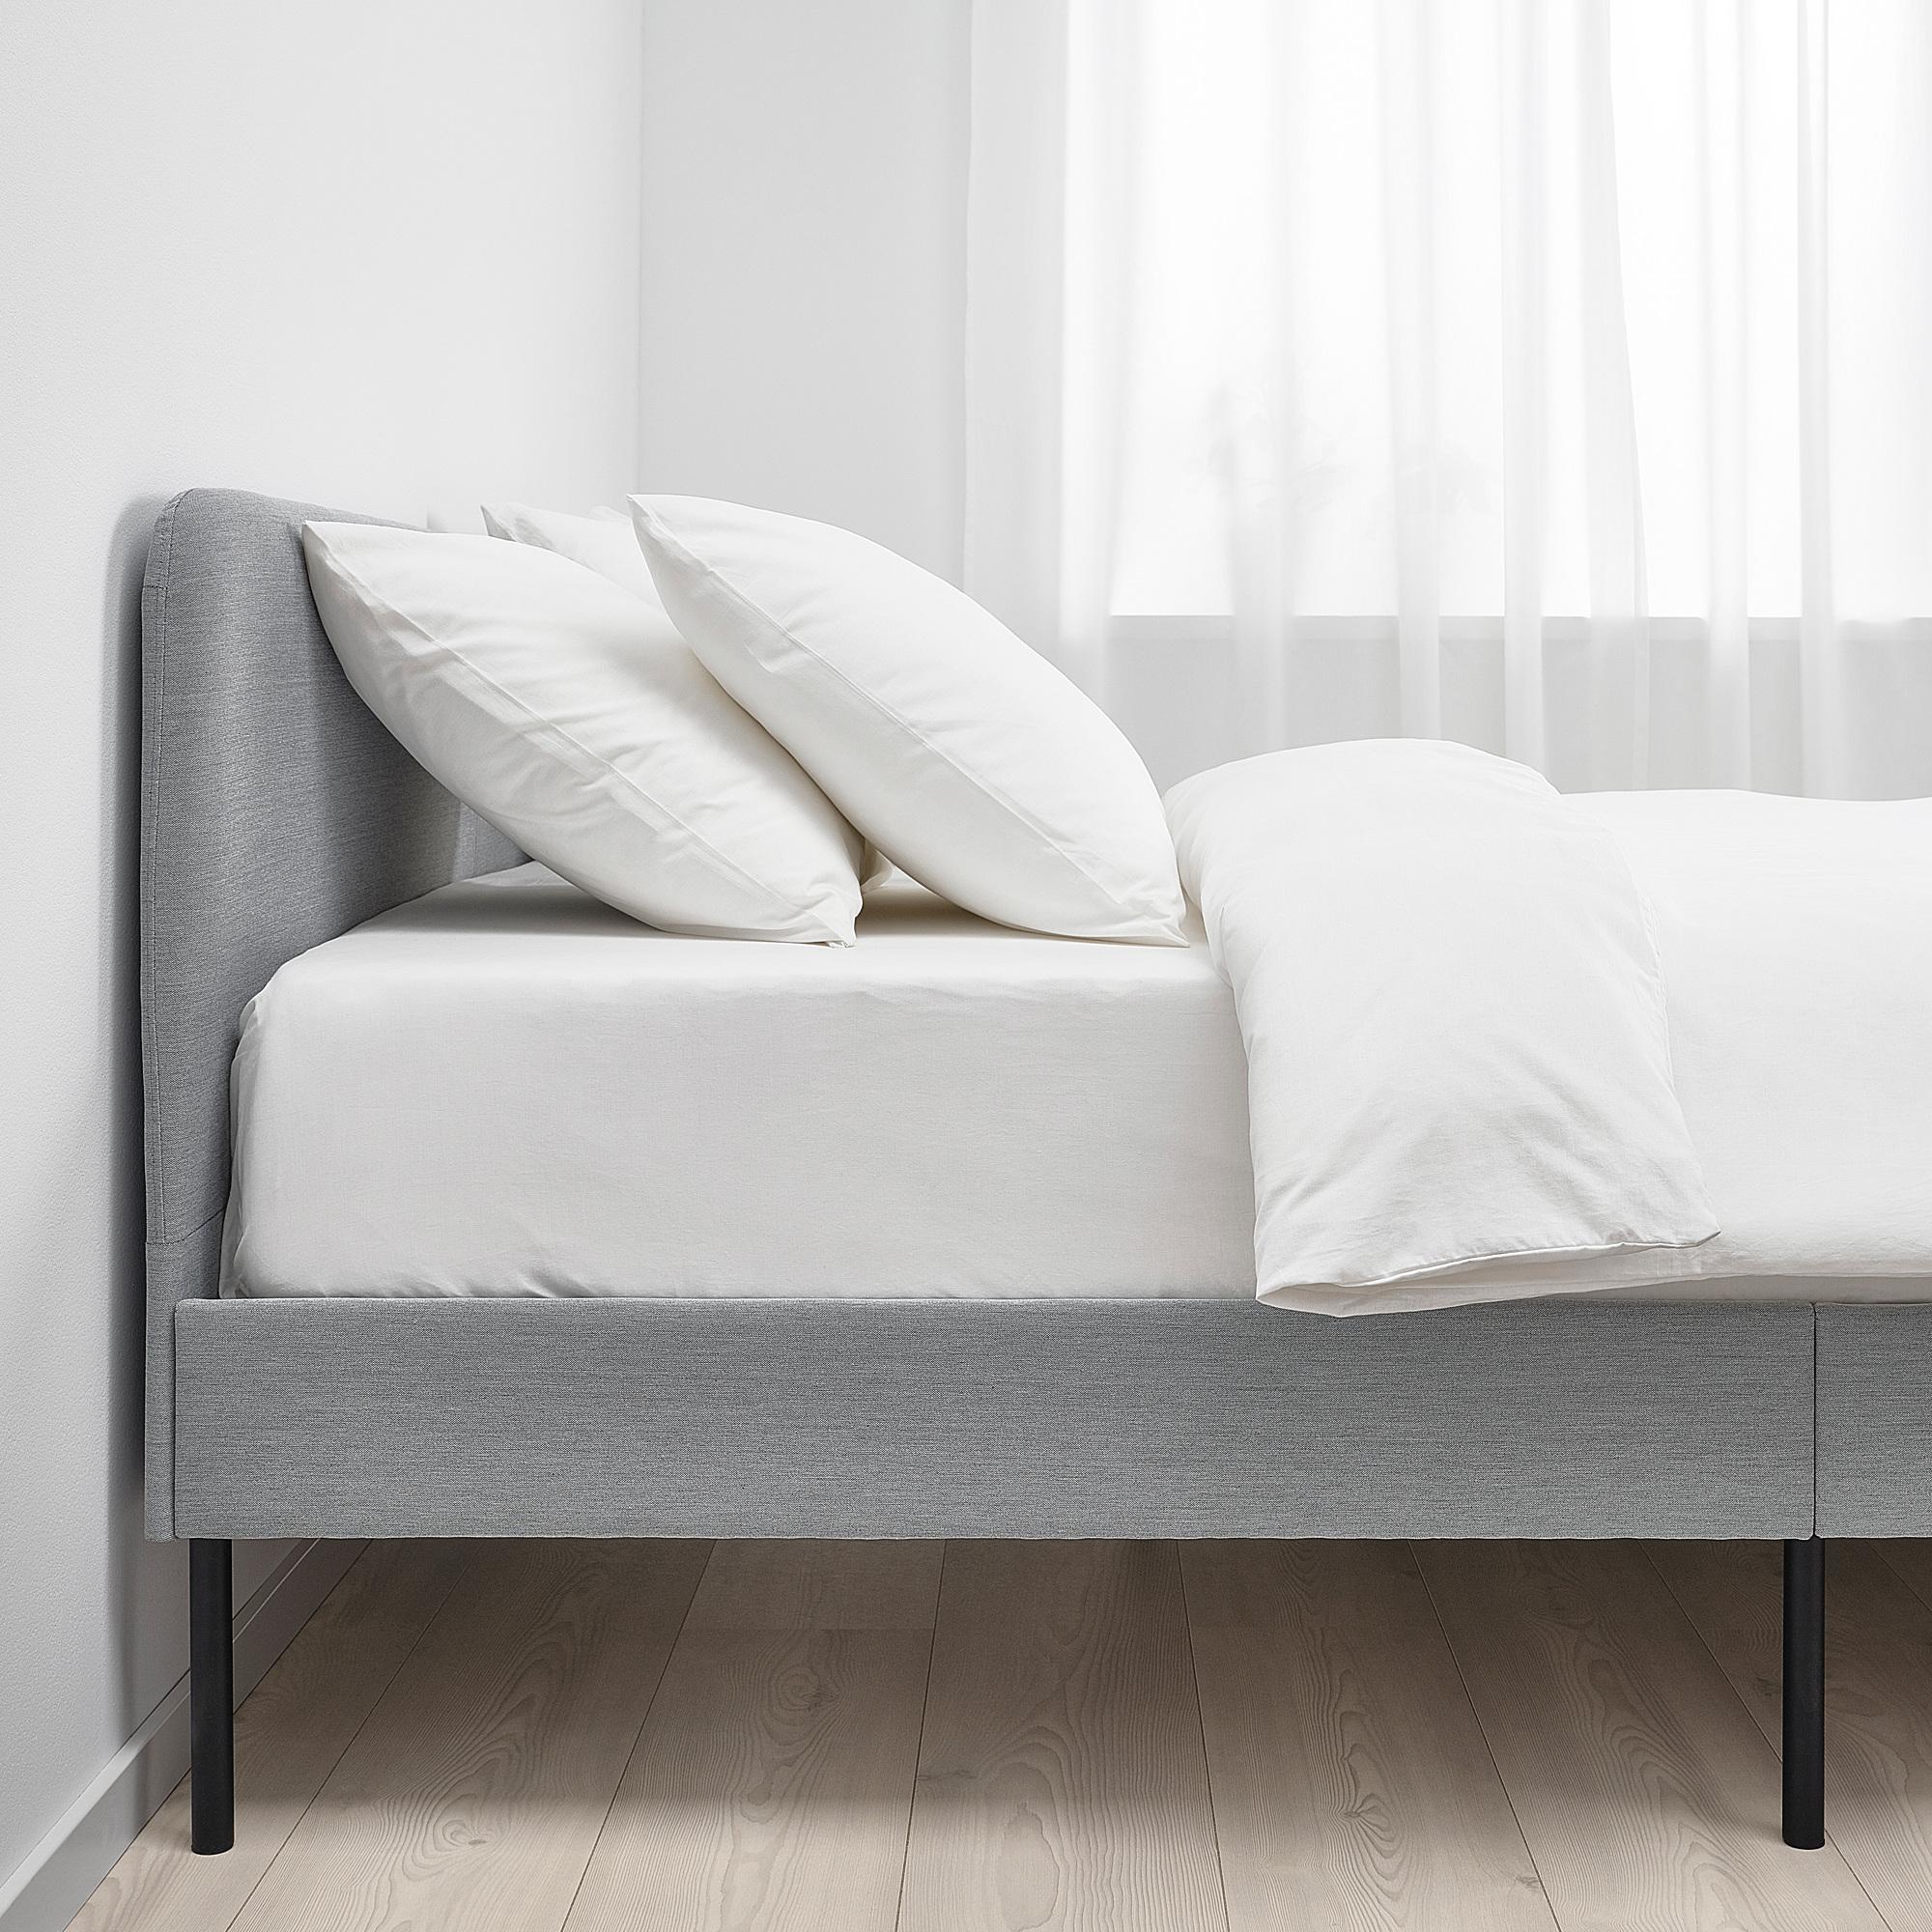 Slattum Upholstered Bed Frame Double Knisa Light Grey Ikea Hong Kong And Macau